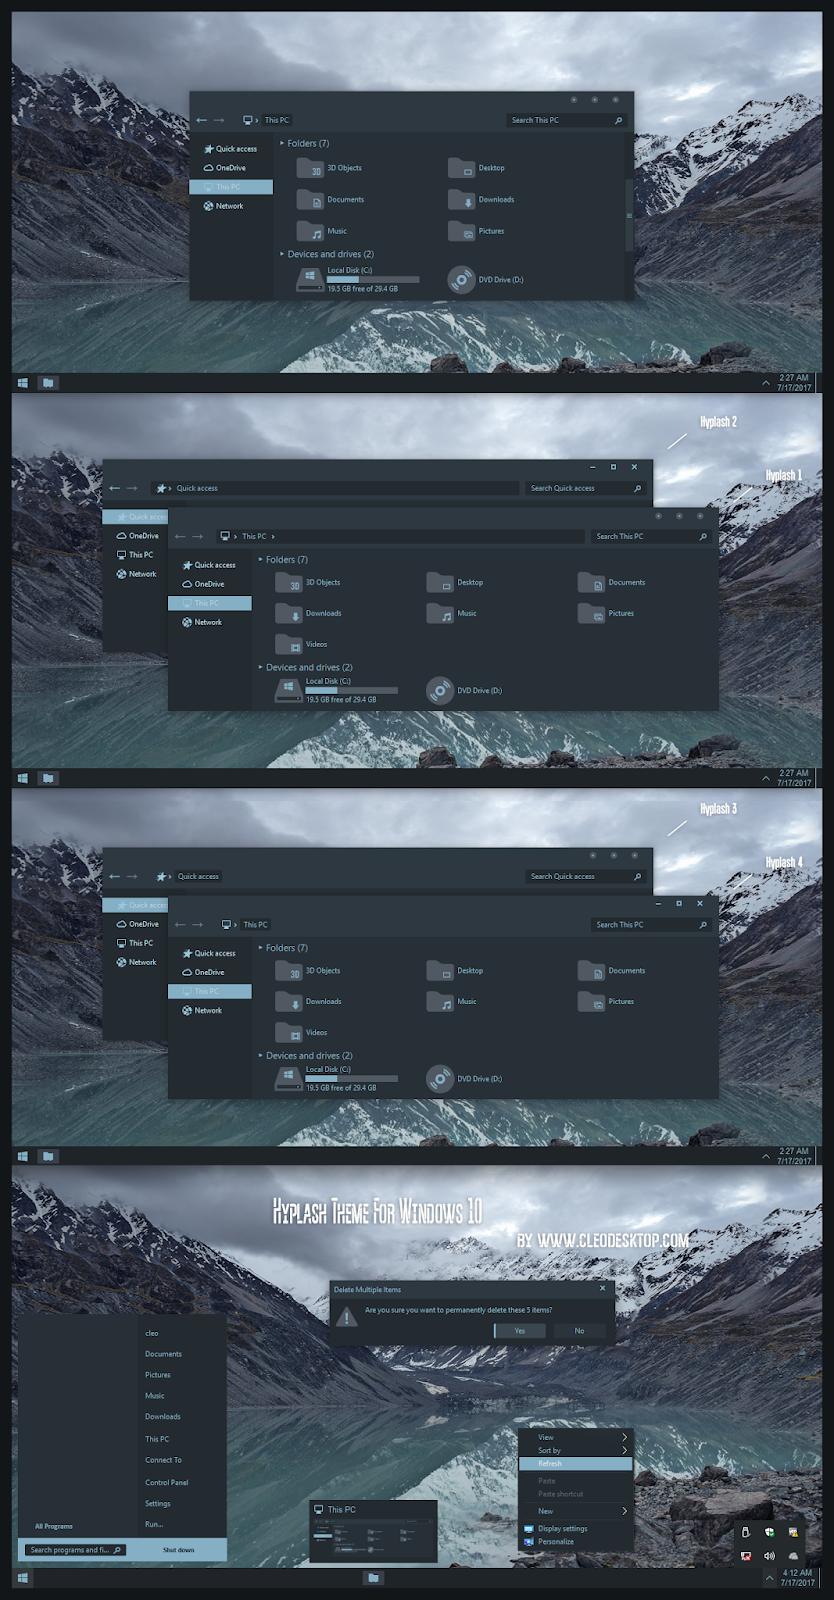 Hyplash Flat Theme Windows10 May 2019 Update 1903